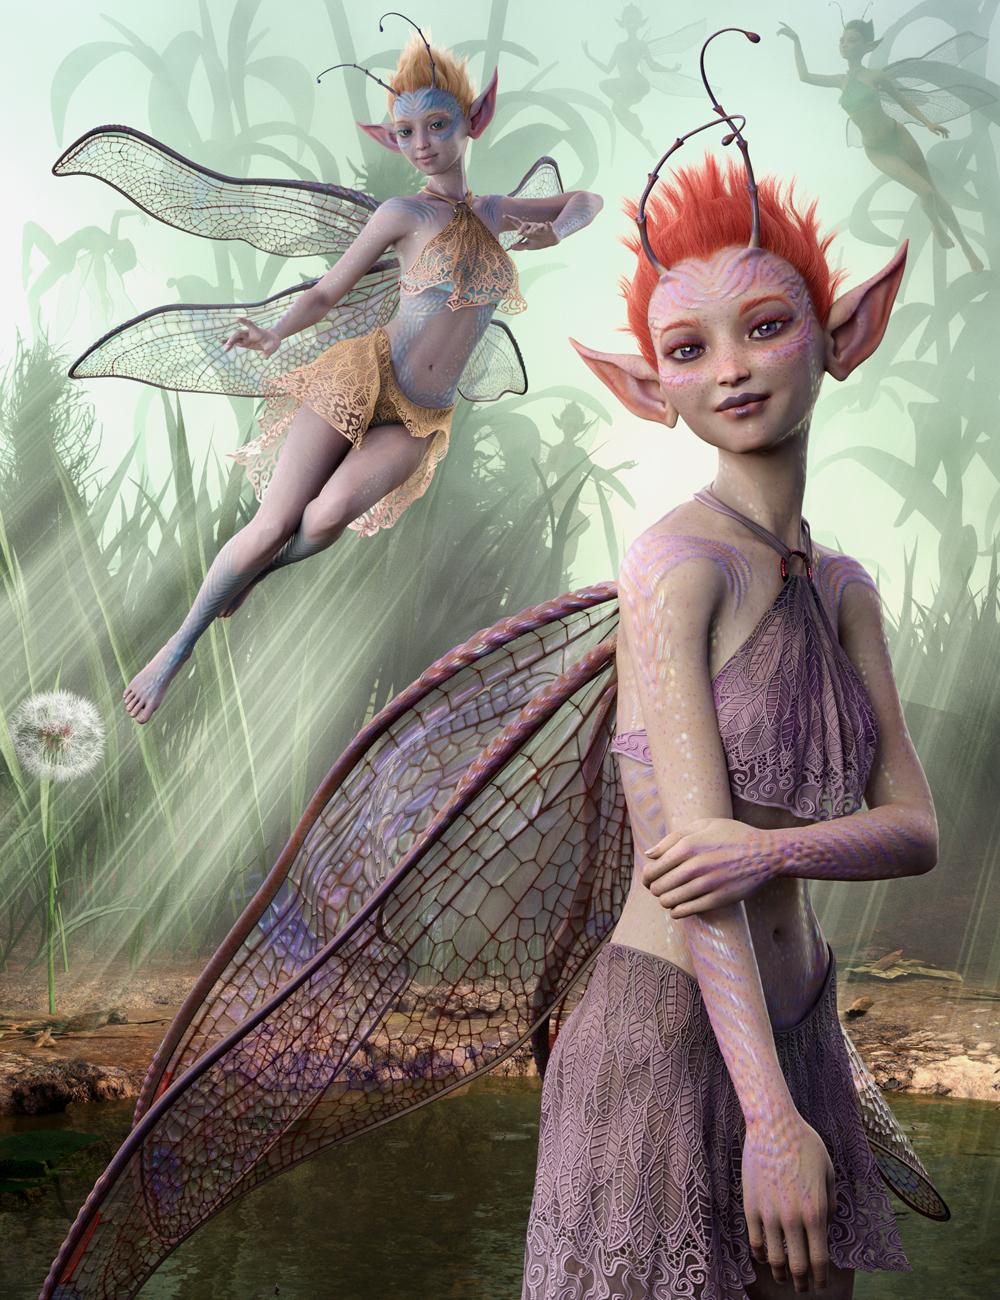 Orla Fae for Genesis 8 Female by: WillDupreMAB, 3D Models by Daz 3D